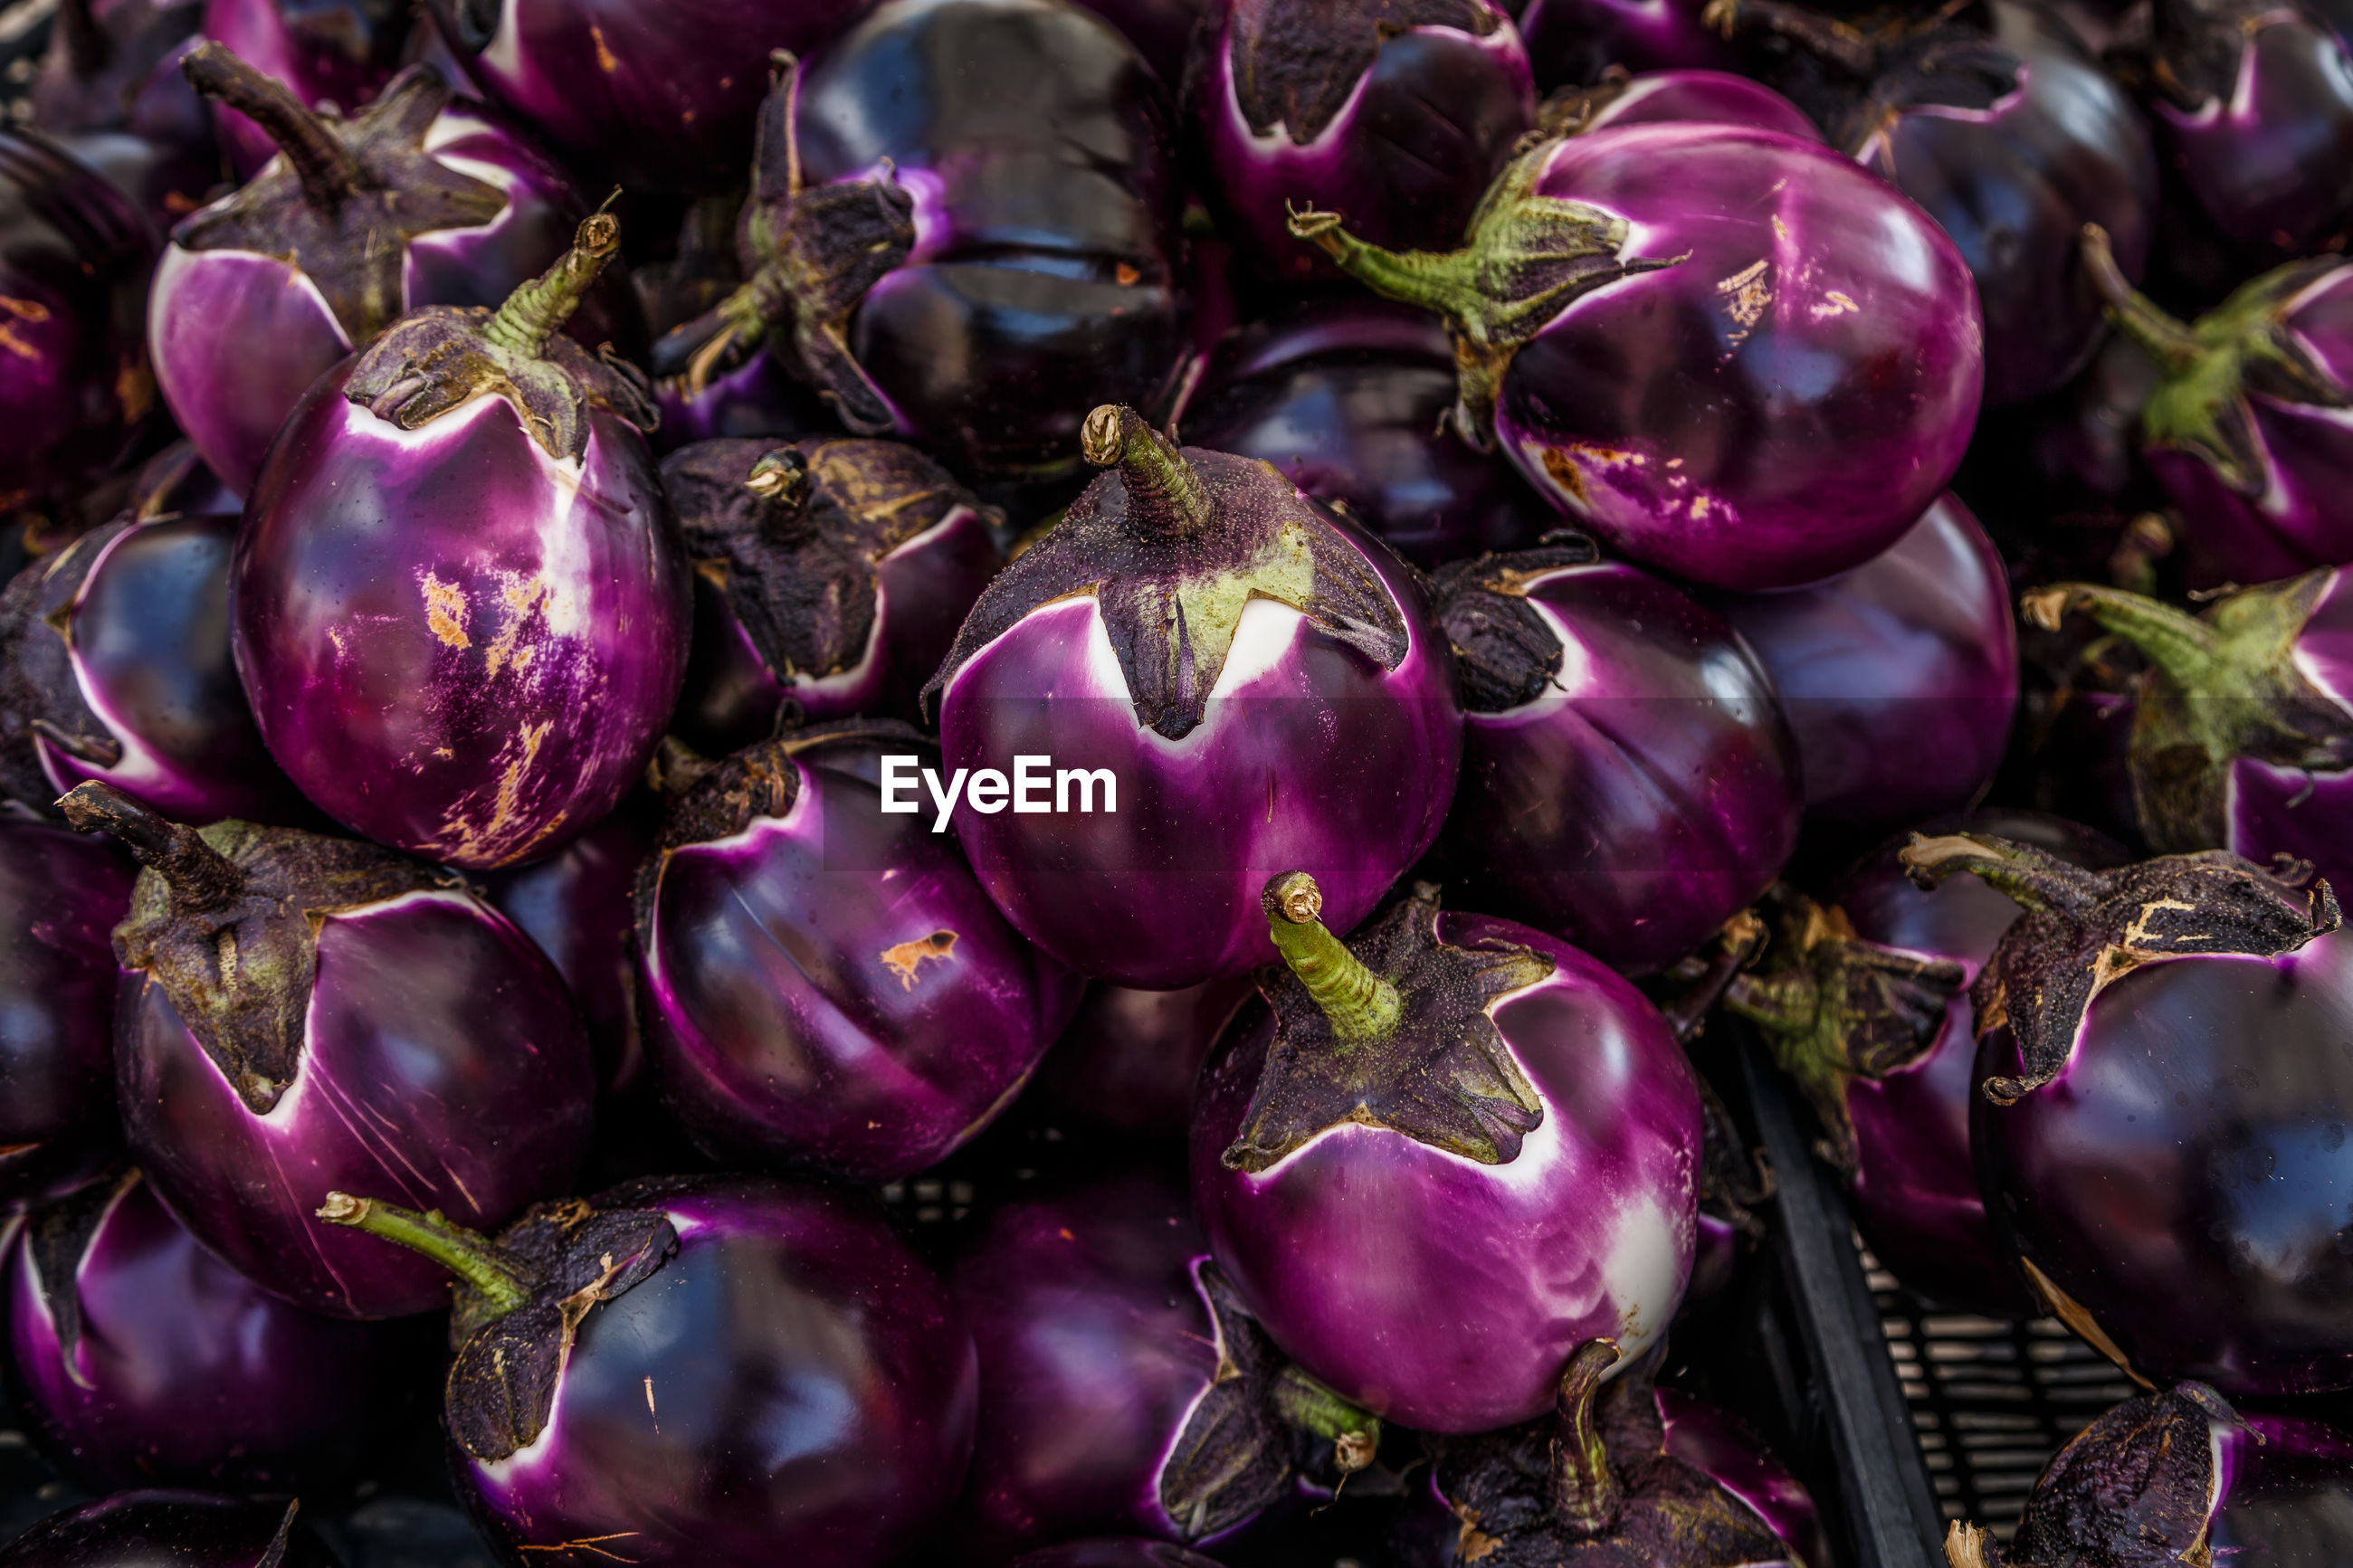 Full frame shot of eggplantd for sale at market stall